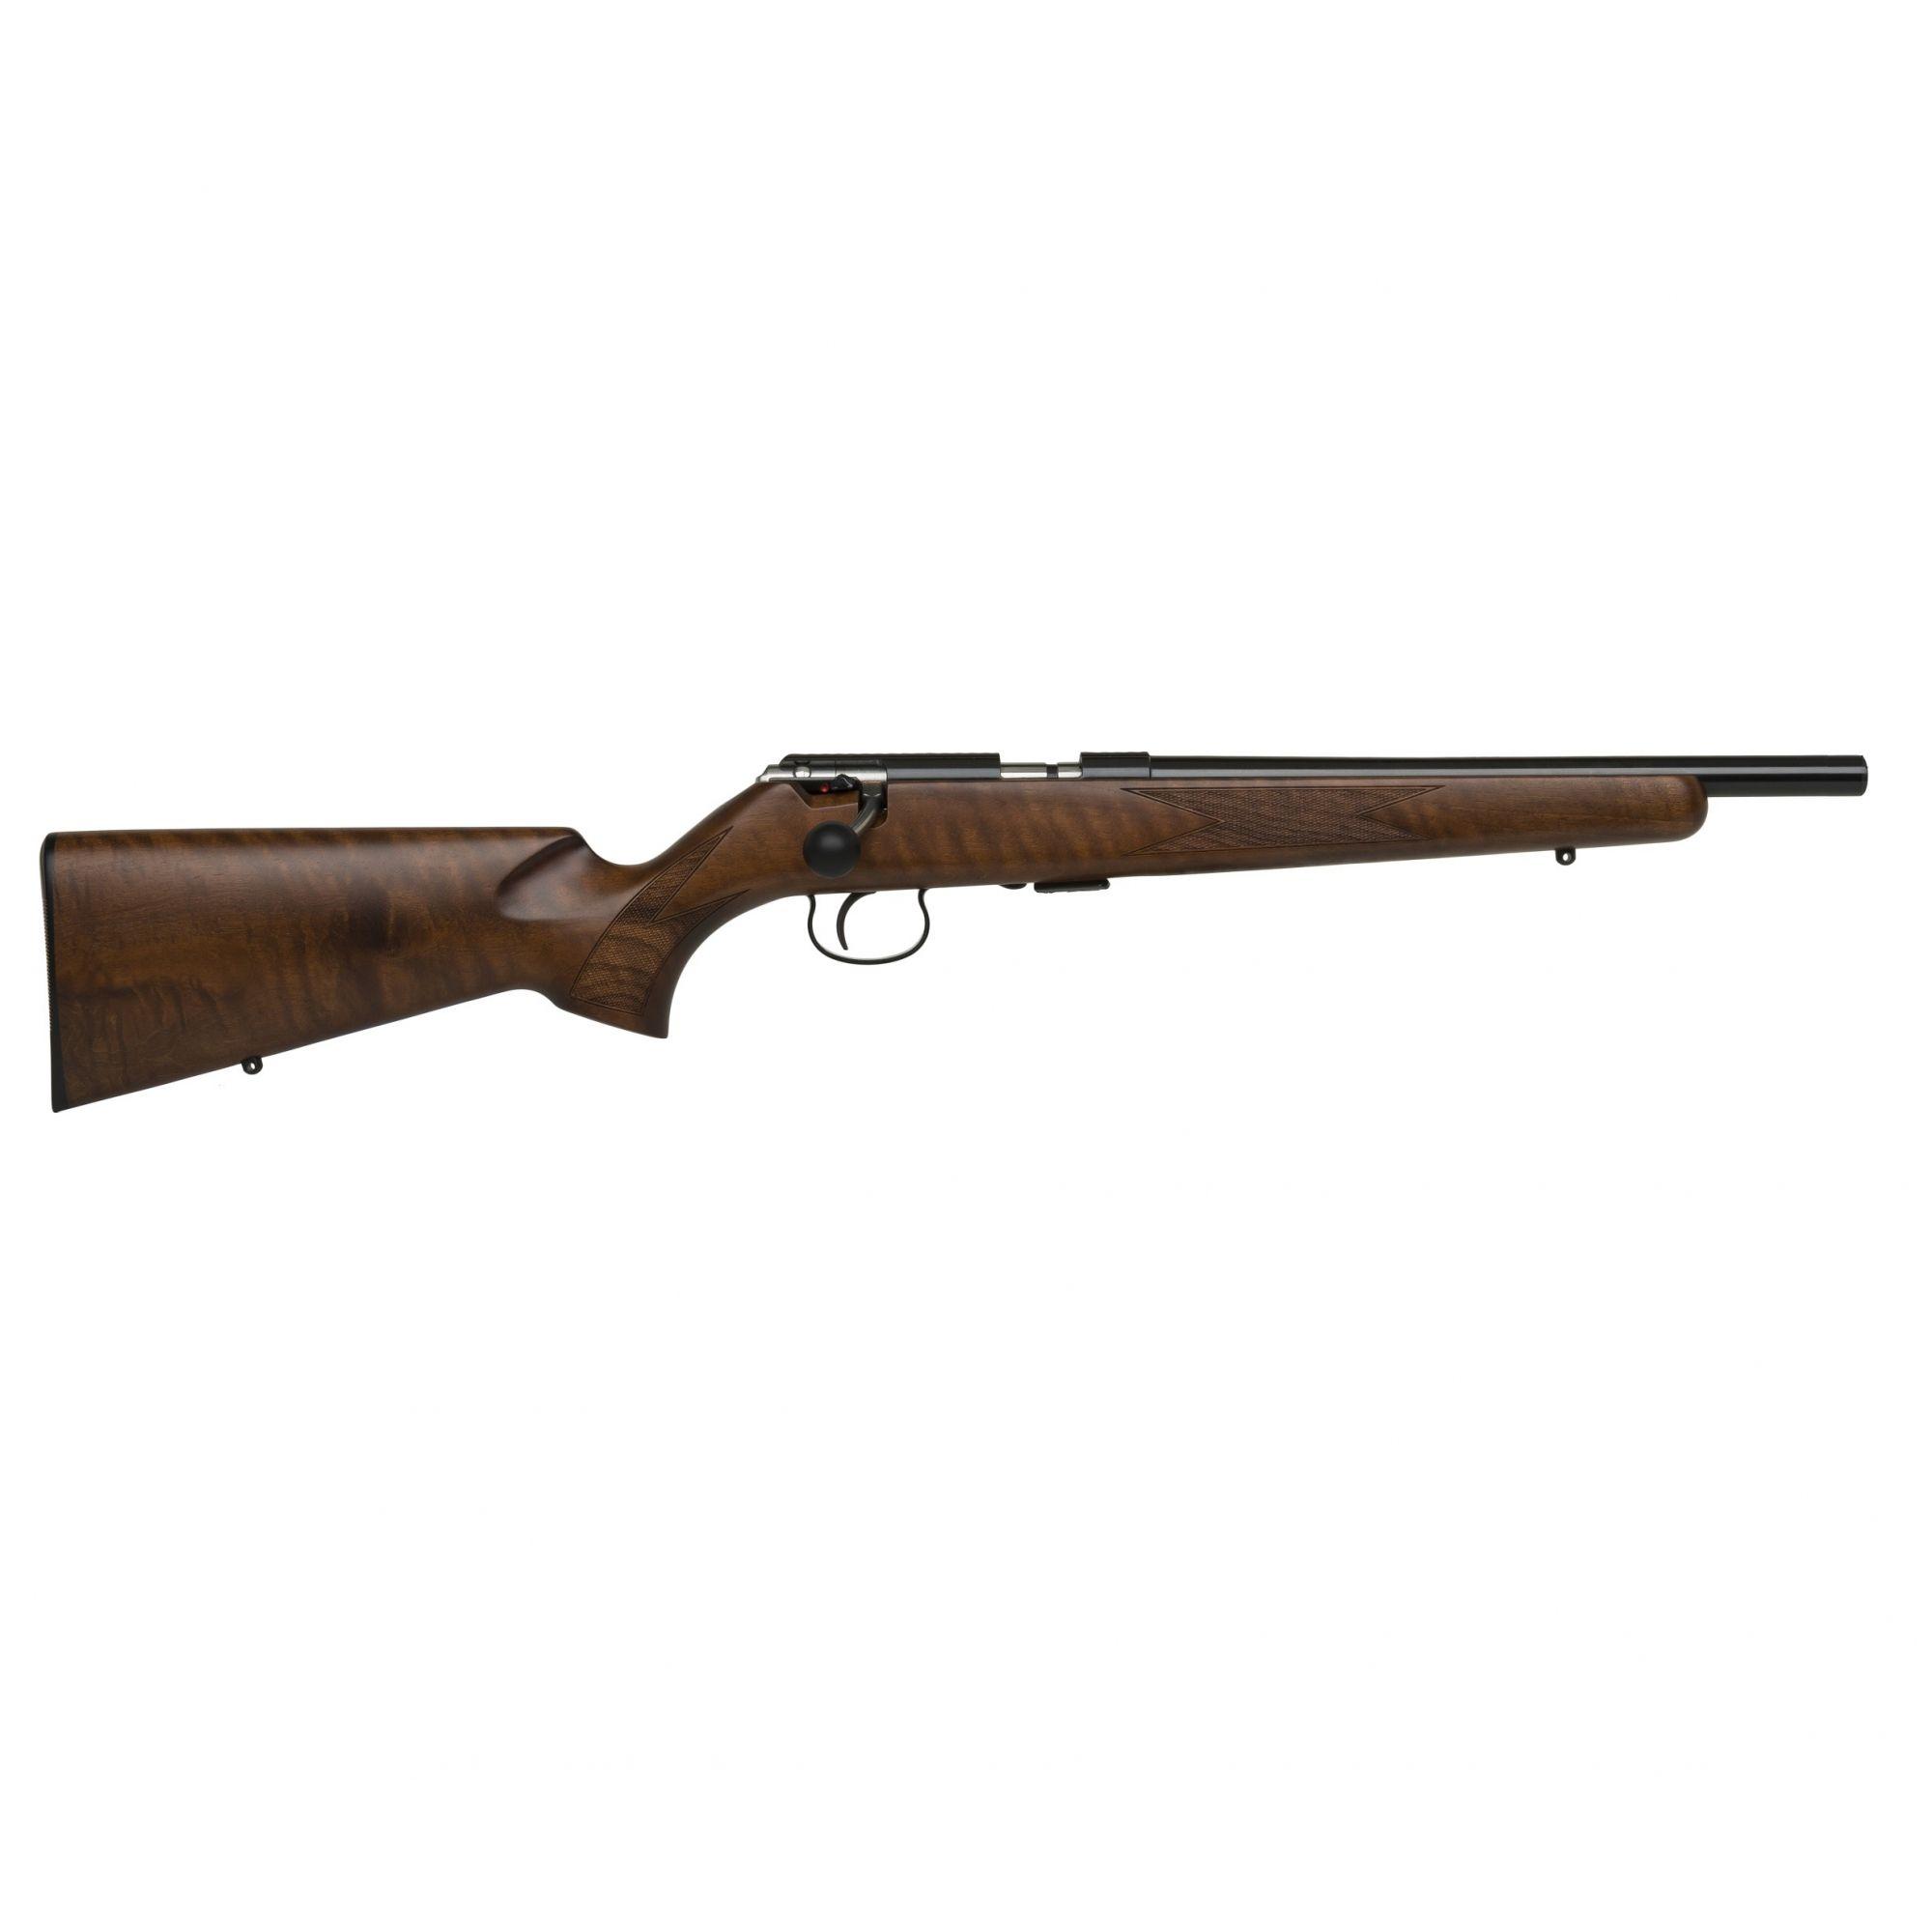 Rifle Anschutz 1416 D HB G Classic - Cano 13,55